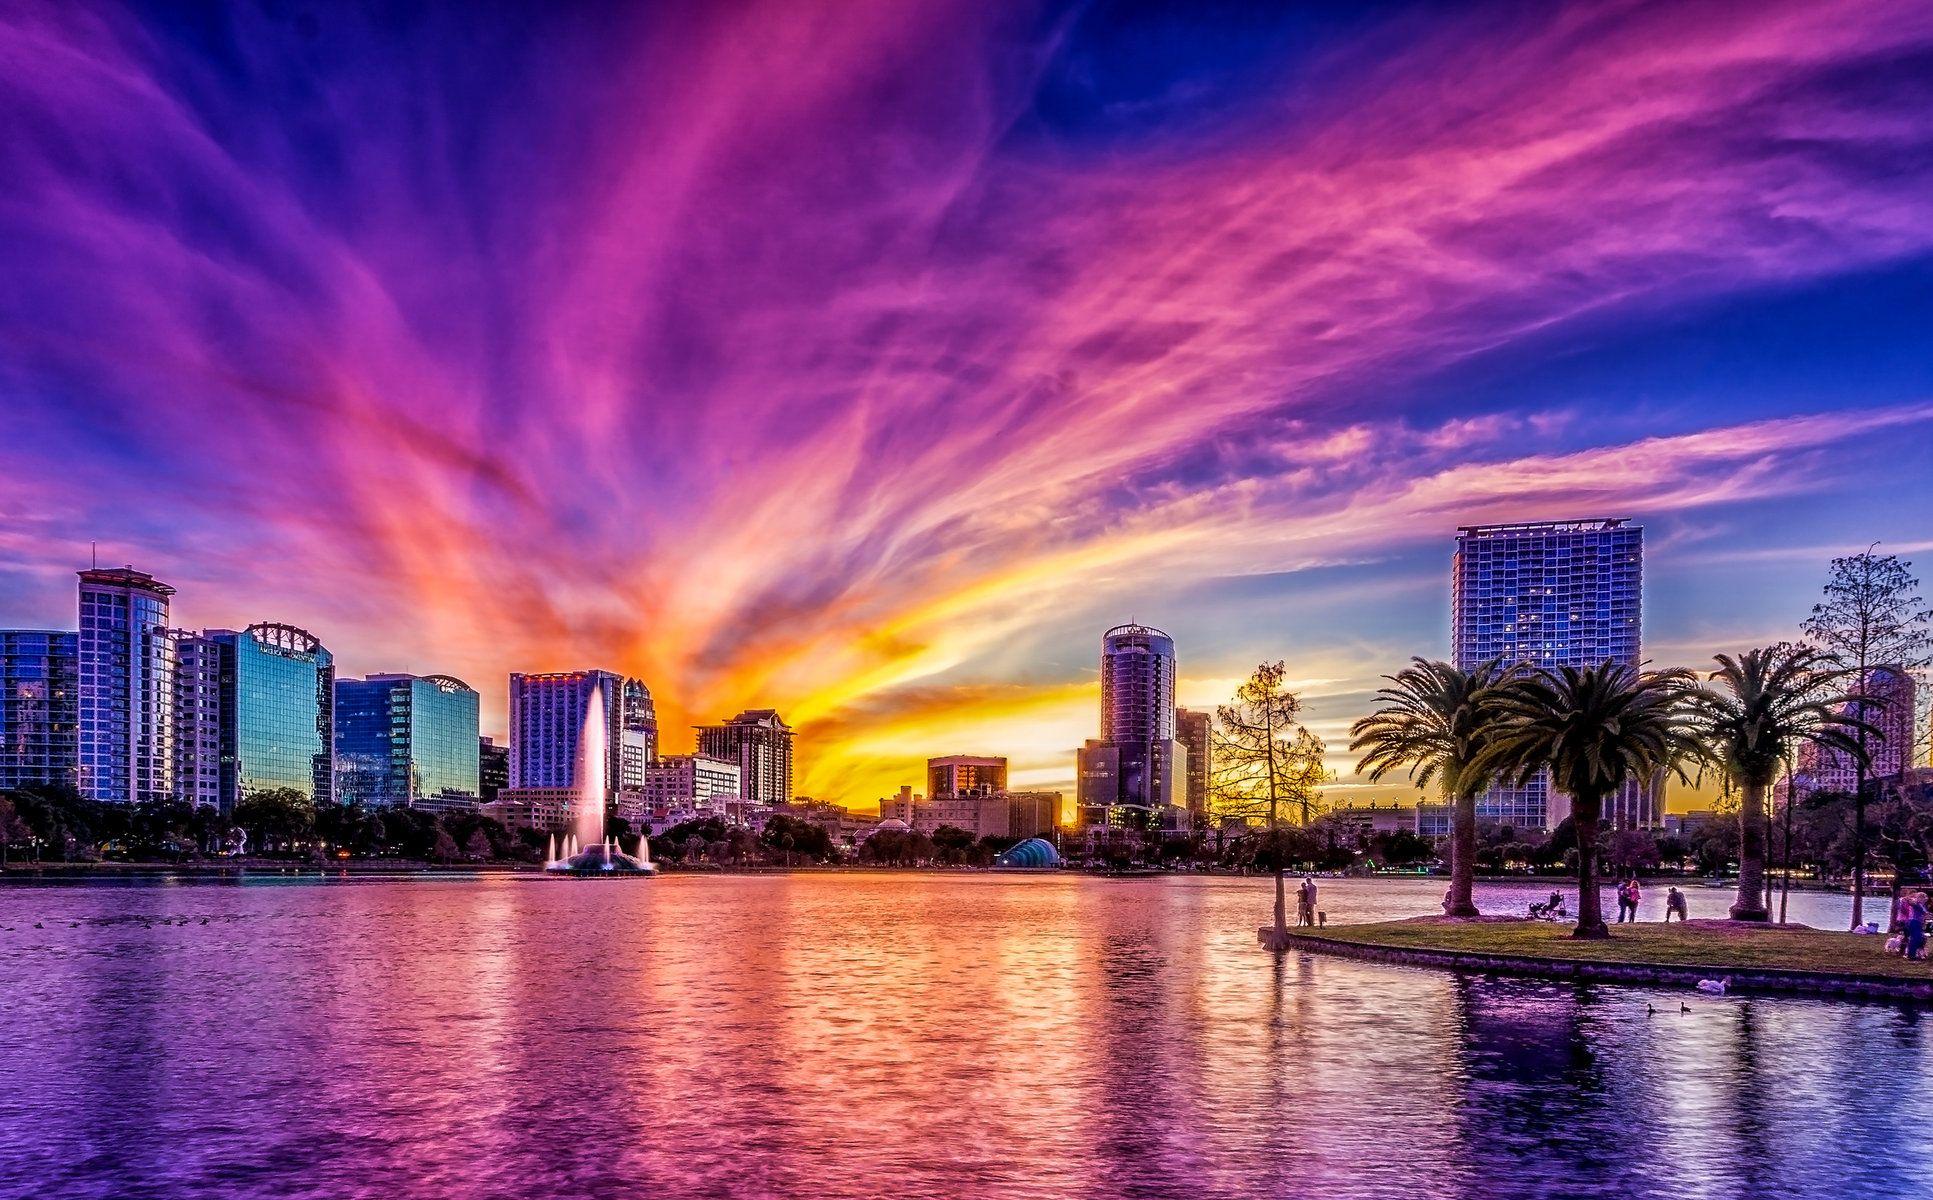 Low Down Payment Auto Insurance 8079 Tuxford Ln Jacksonville Fl